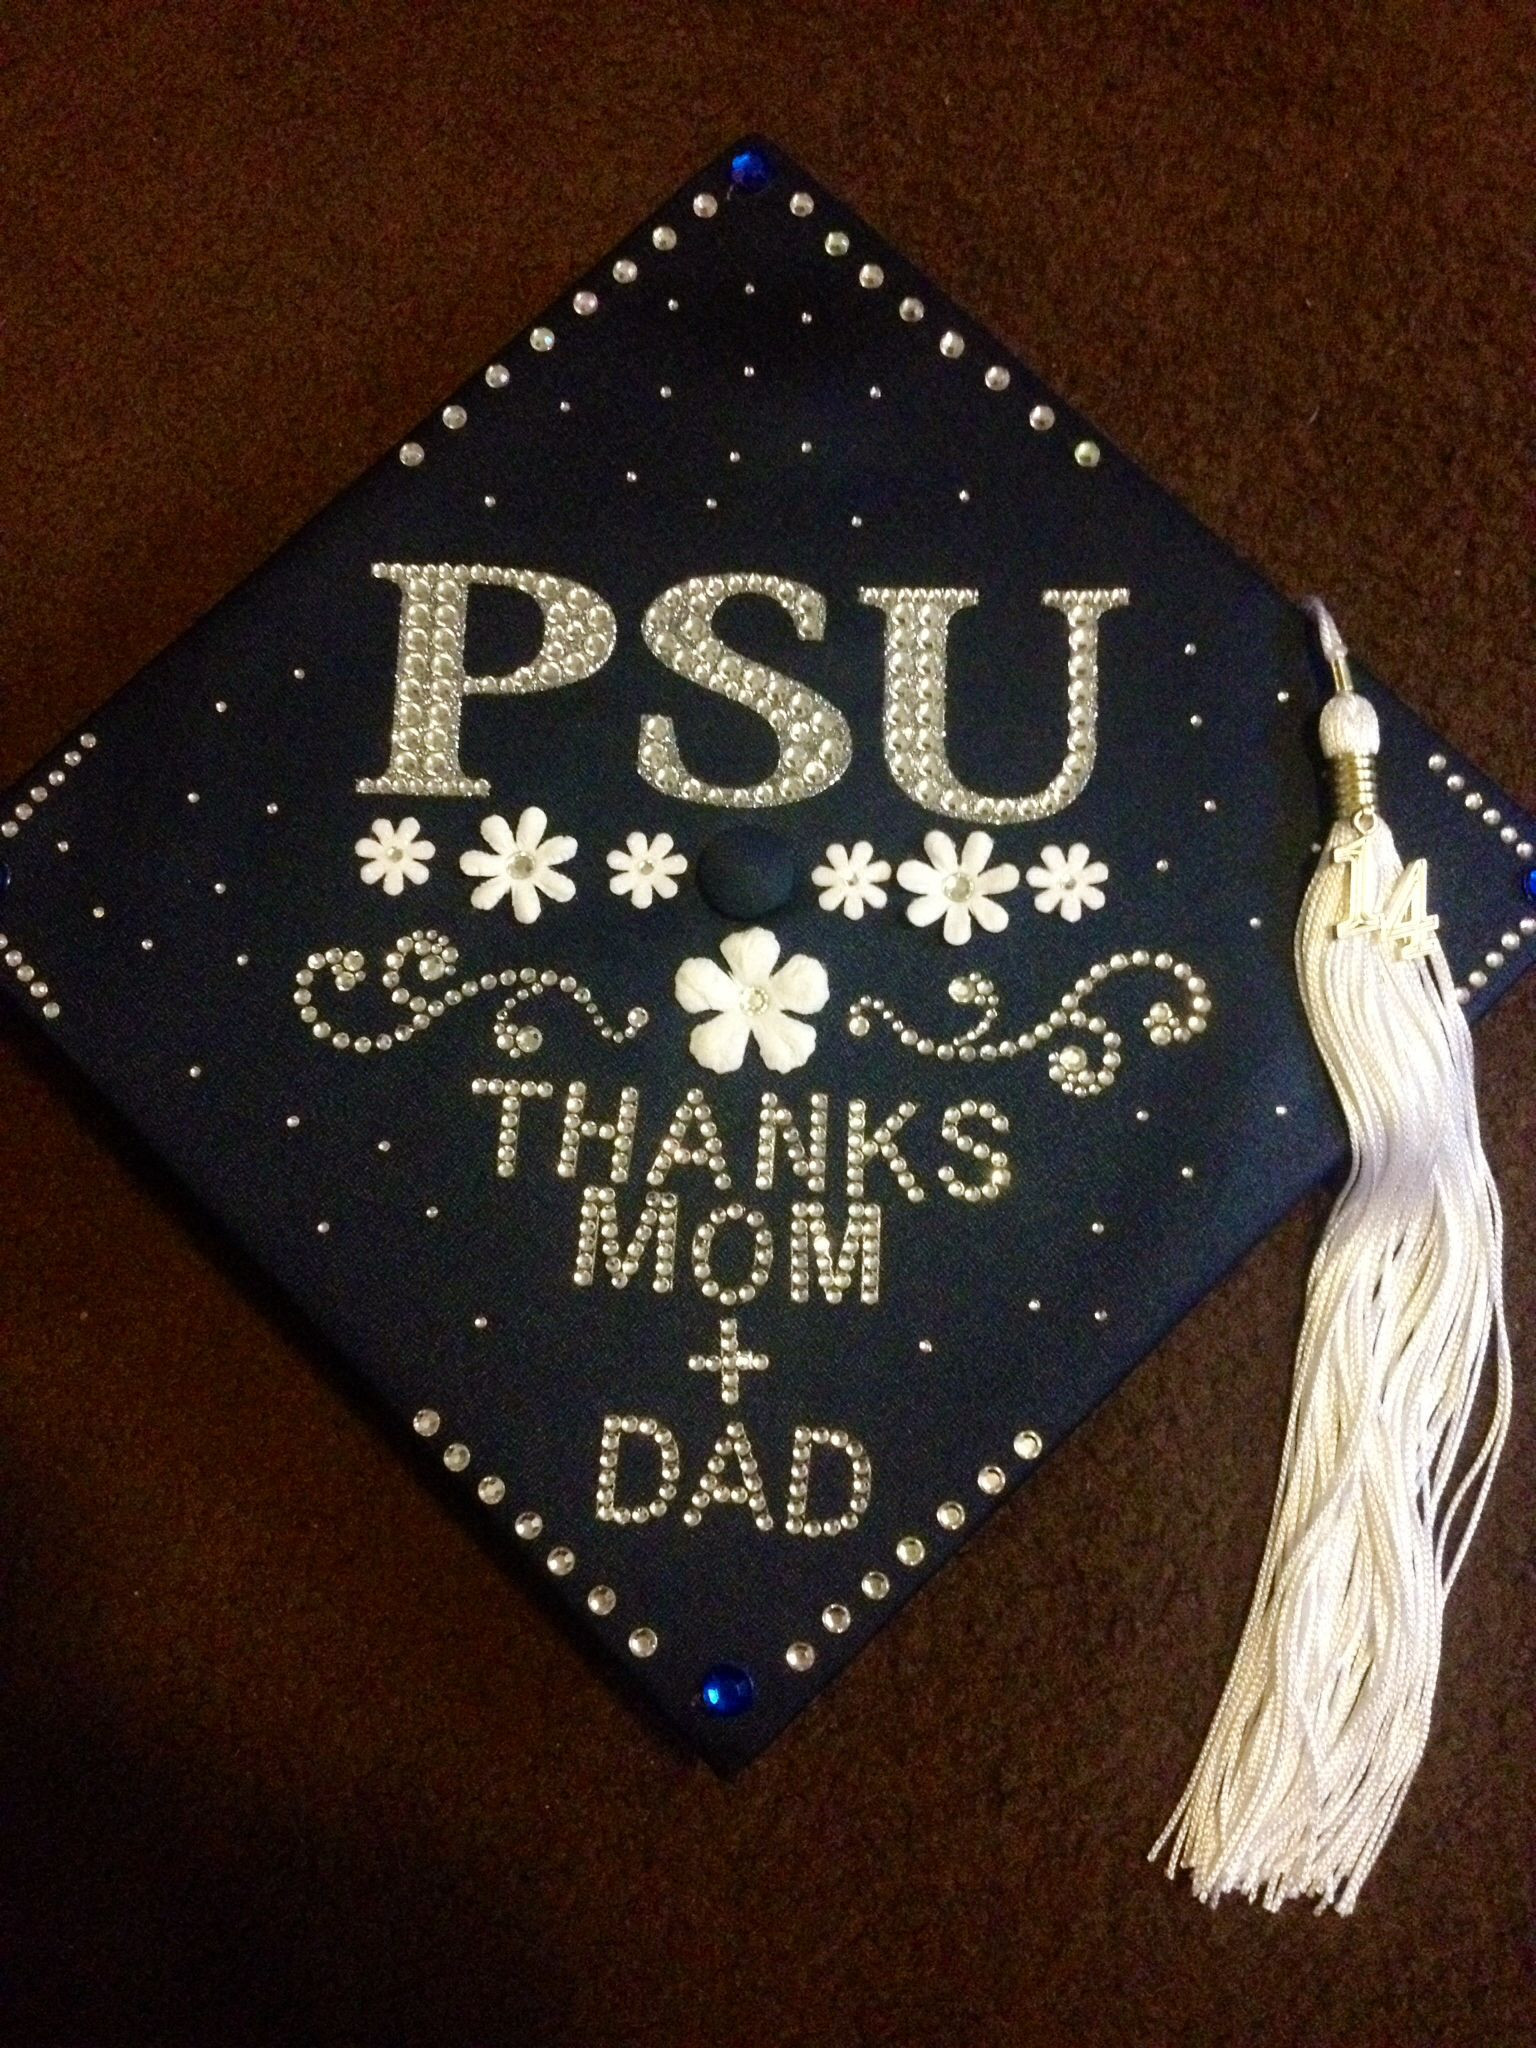 Penn State Graduation Gift Ideas  Penn state graduation cap 2014 psugrad